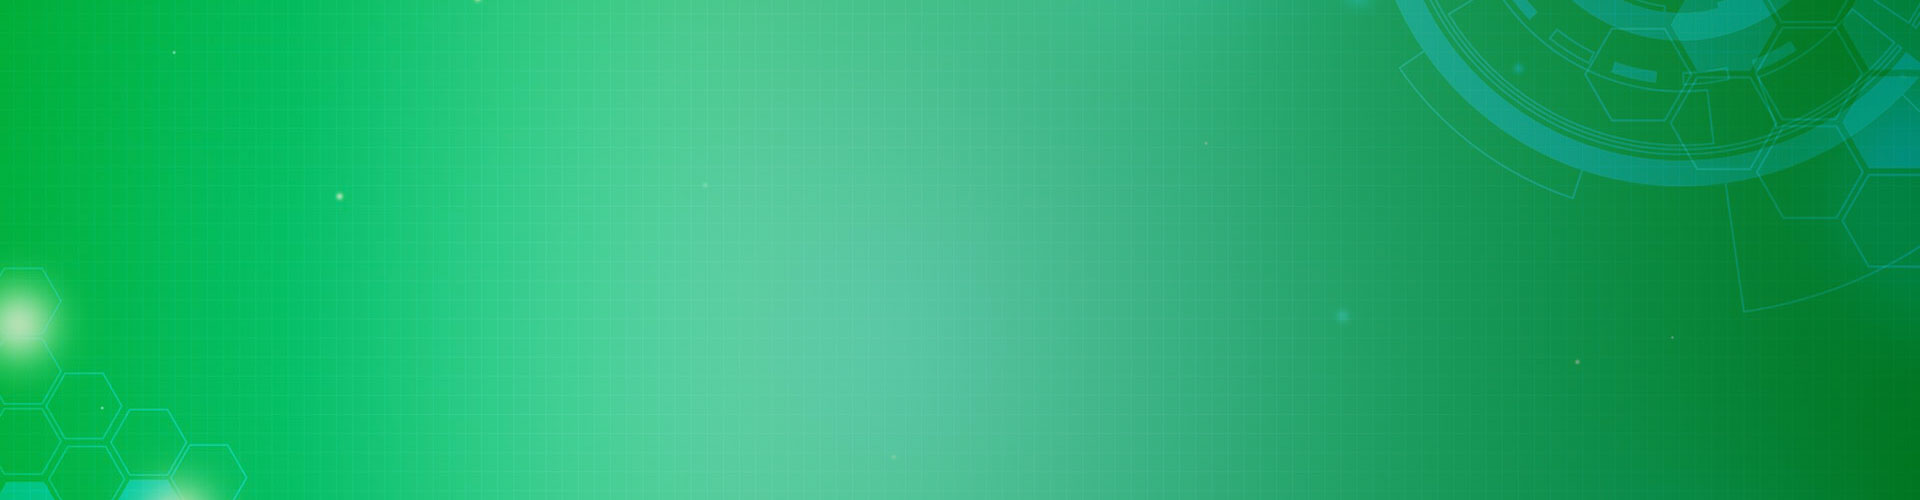 cherwellback5